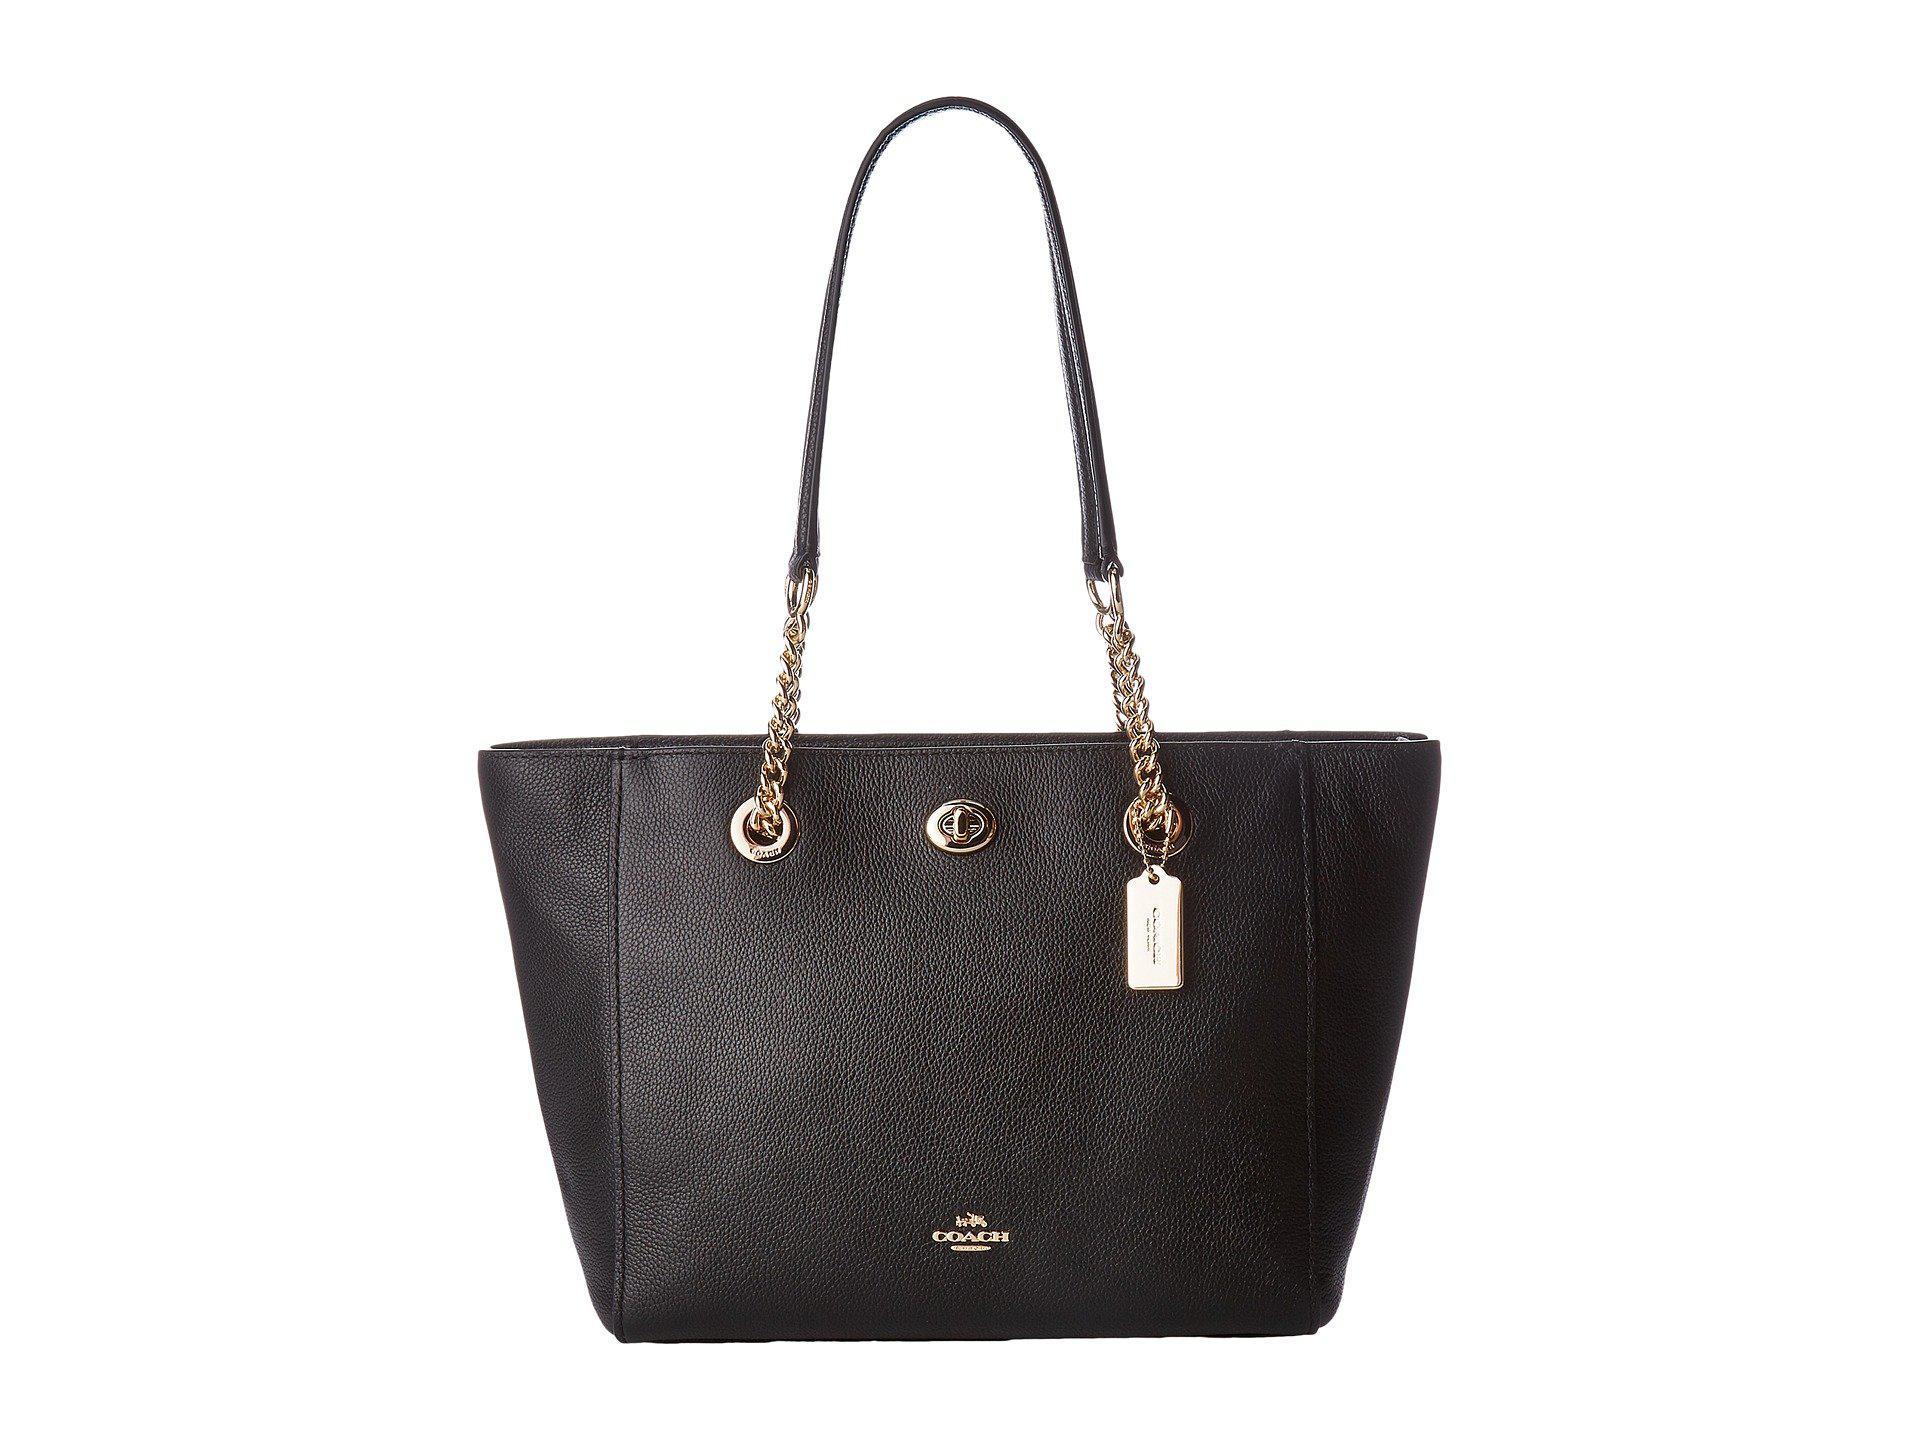 Lyst - COACH Pebbled Turnlock Chain Tote 27 (li black) Tote Handbags fba7d75f308be